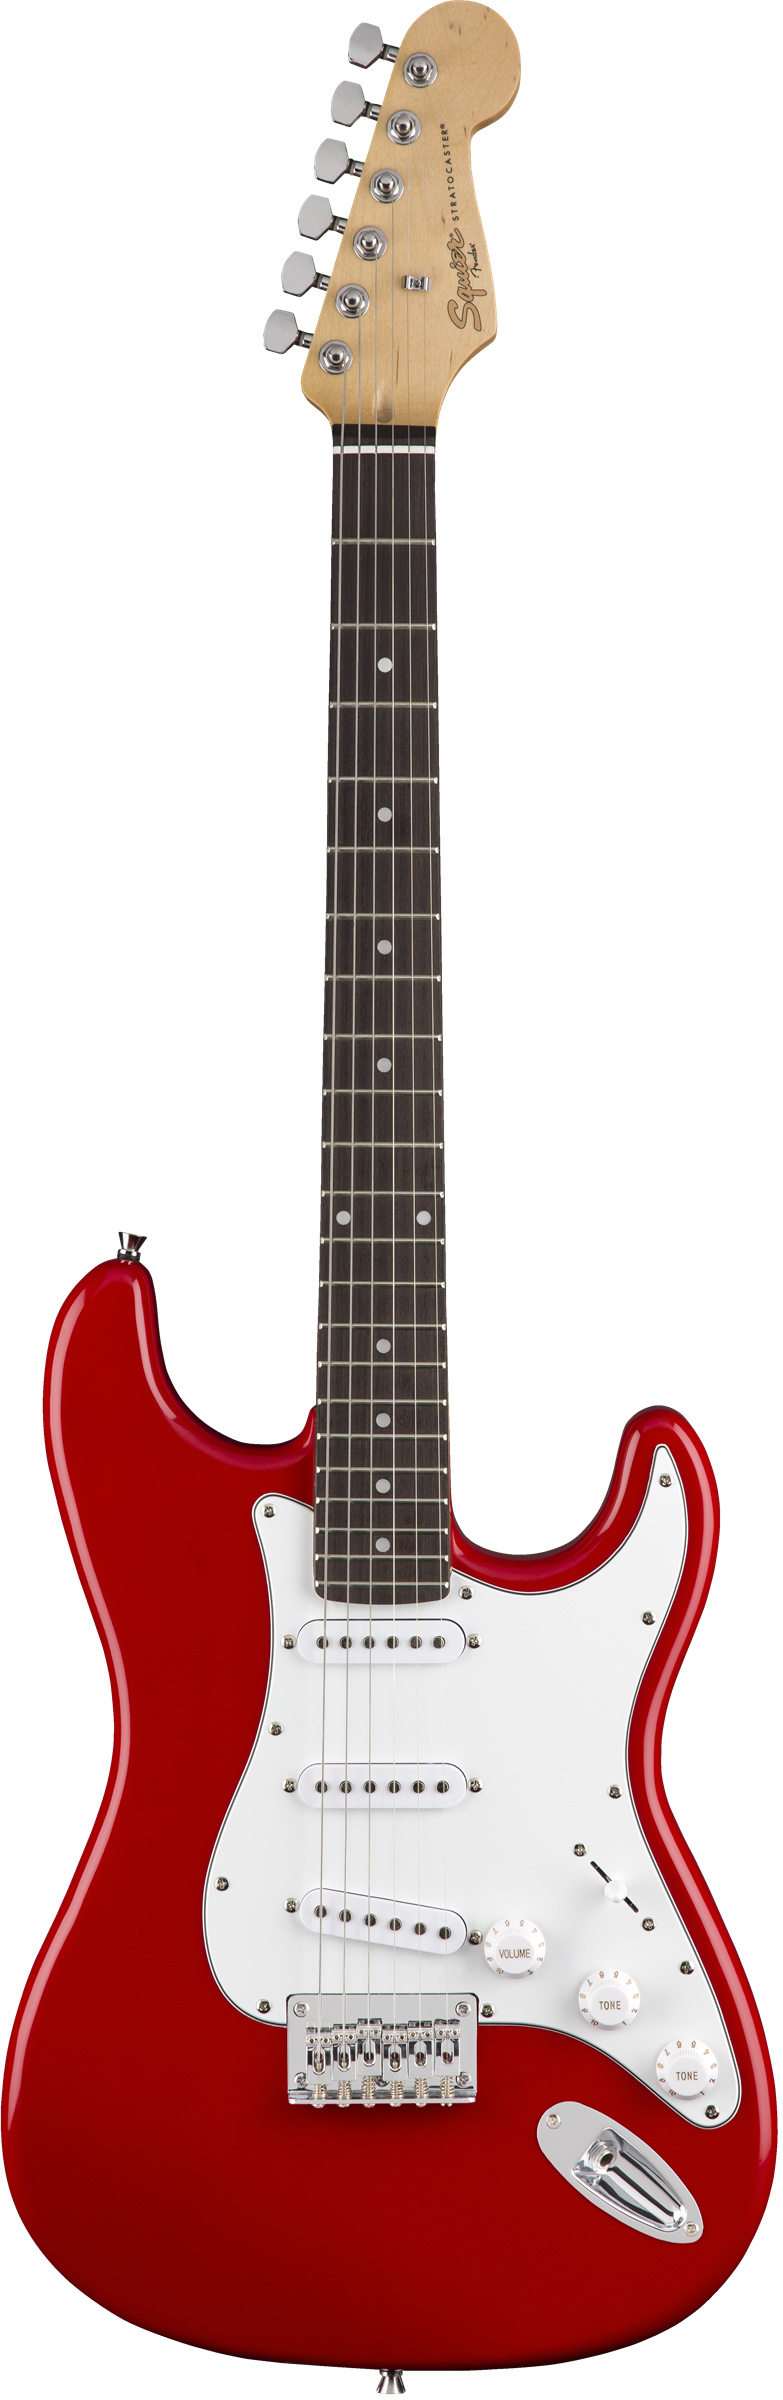 FENDER SQUIER MM STRATOCASTER HARD TAIL RED электрогитара, цвет красный, гриф - клён, бридж